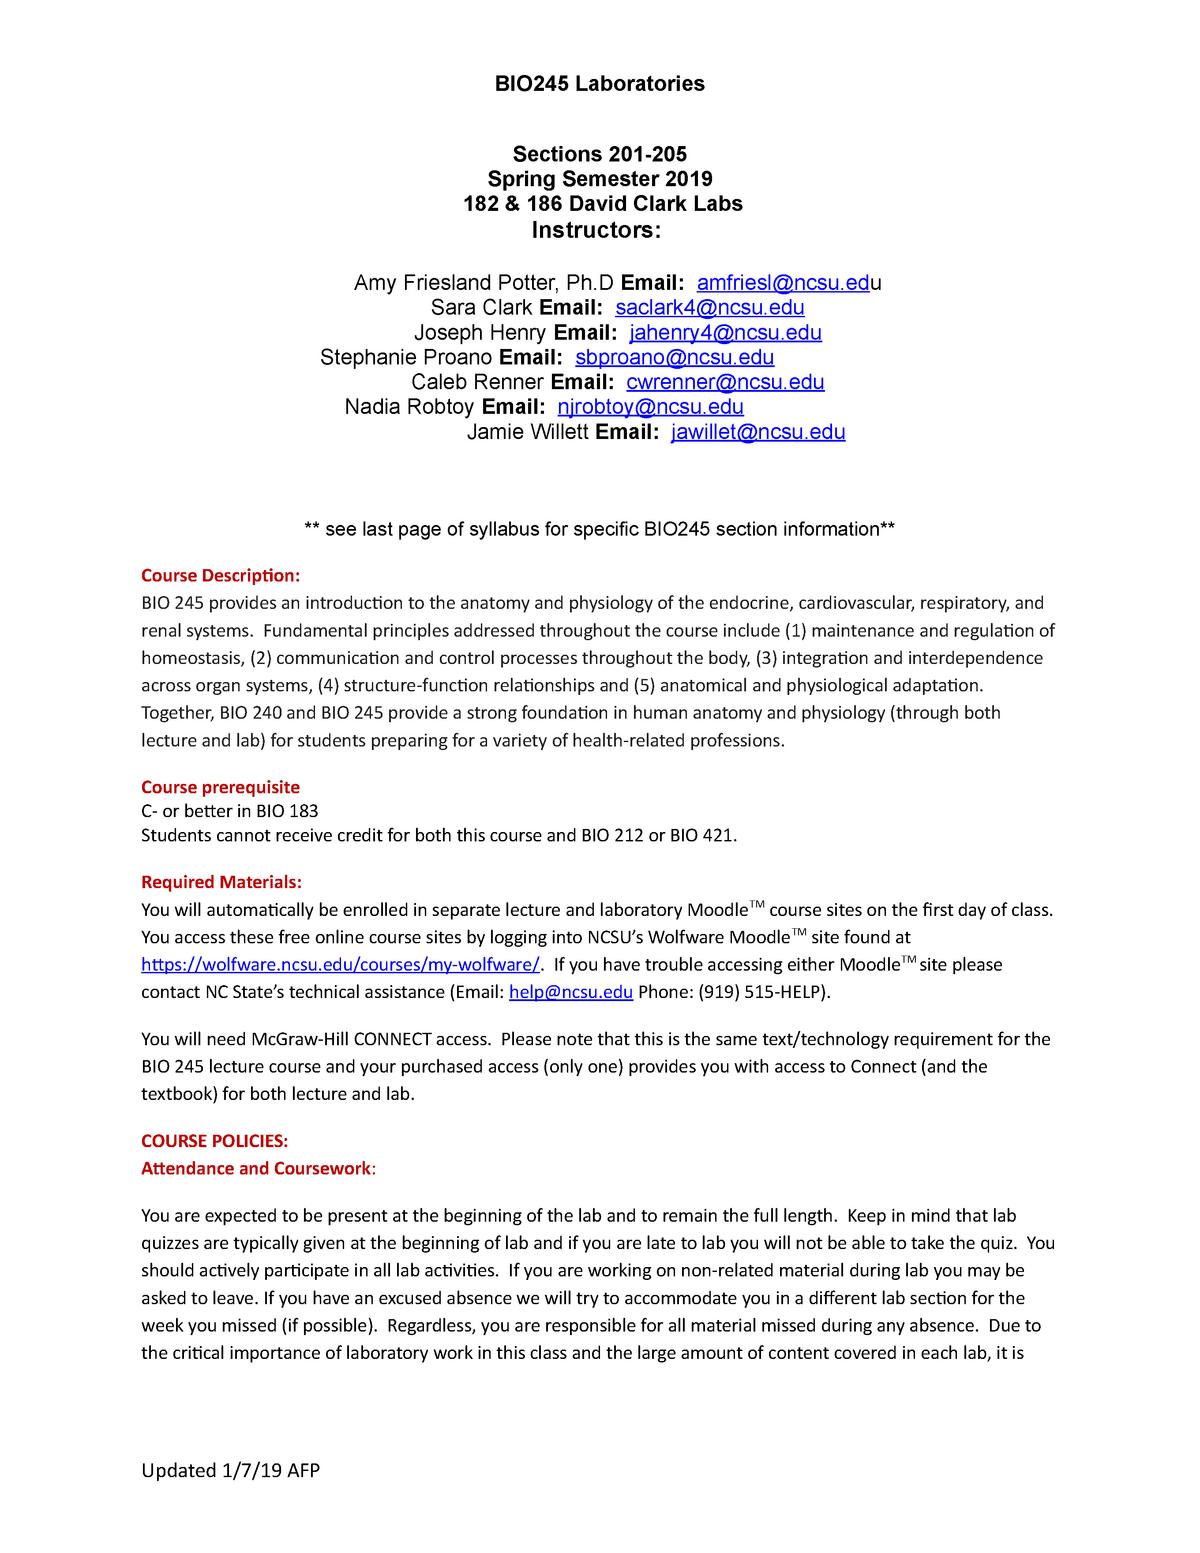 Ncsu Academic Calendar.Bio245 Lab Syllabus Spring 2019 Final Bio 245 Principles Of Human